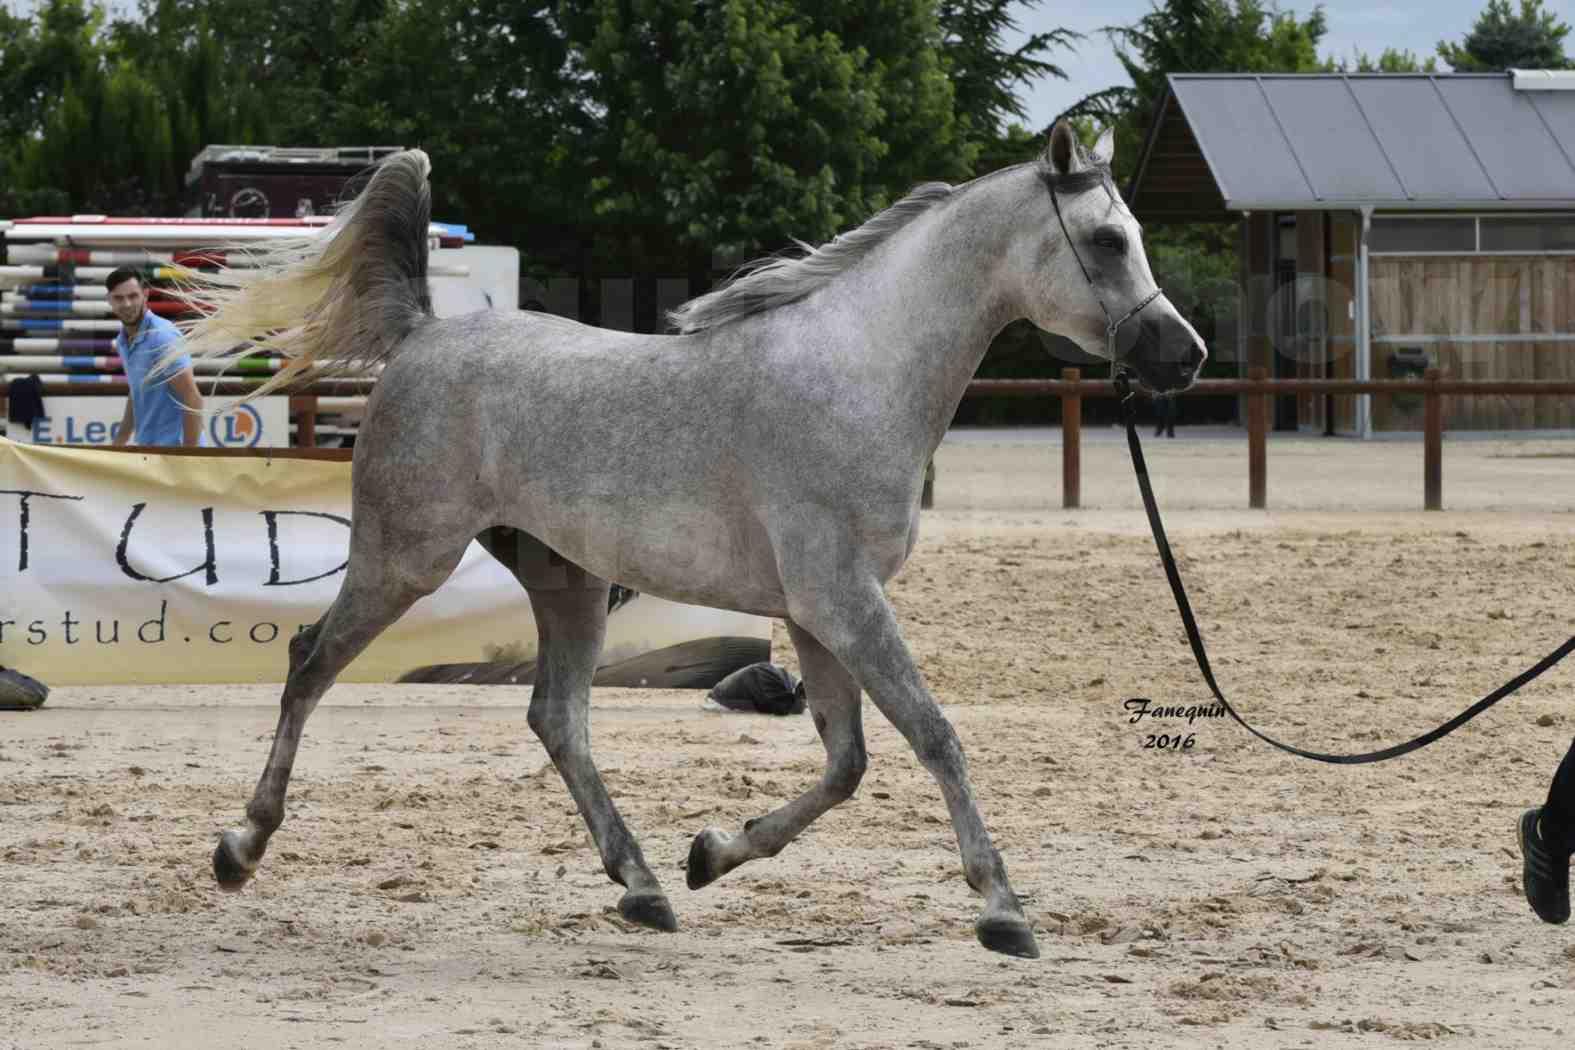 Show national de chevaux arabe à CHAZEY sur AIN - ANWAR ISHANE - 1